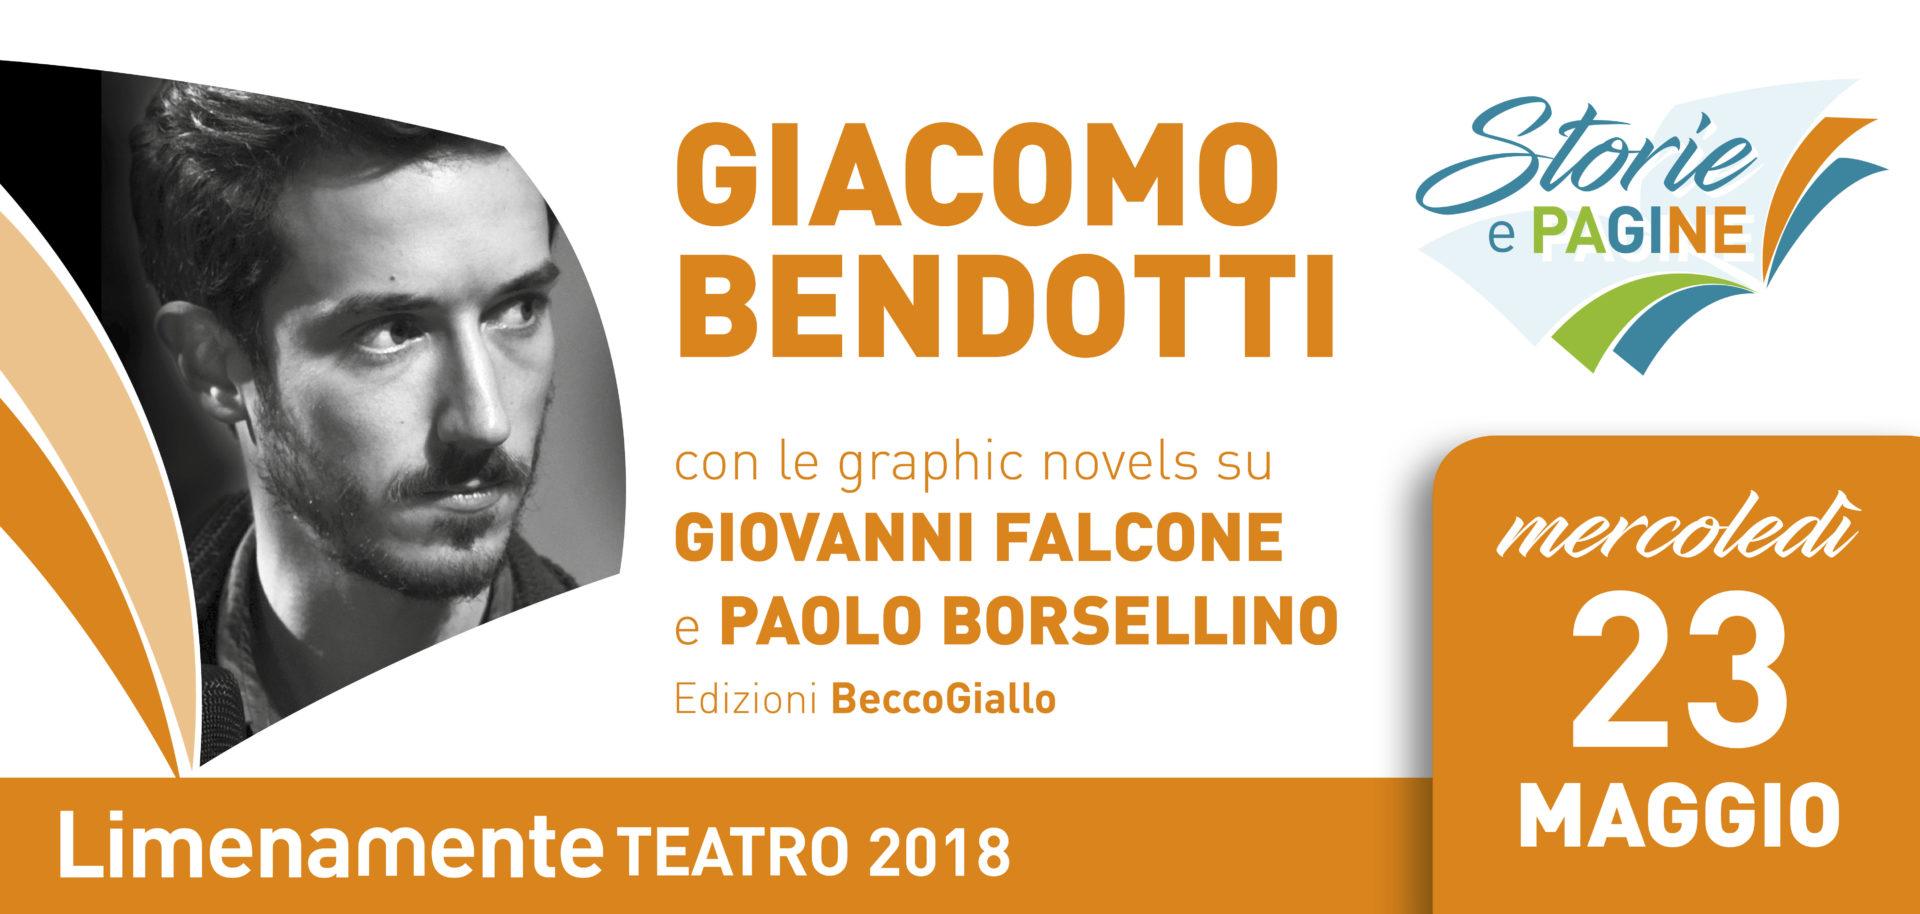 Storie e Pagine – Giacomo Bendotti